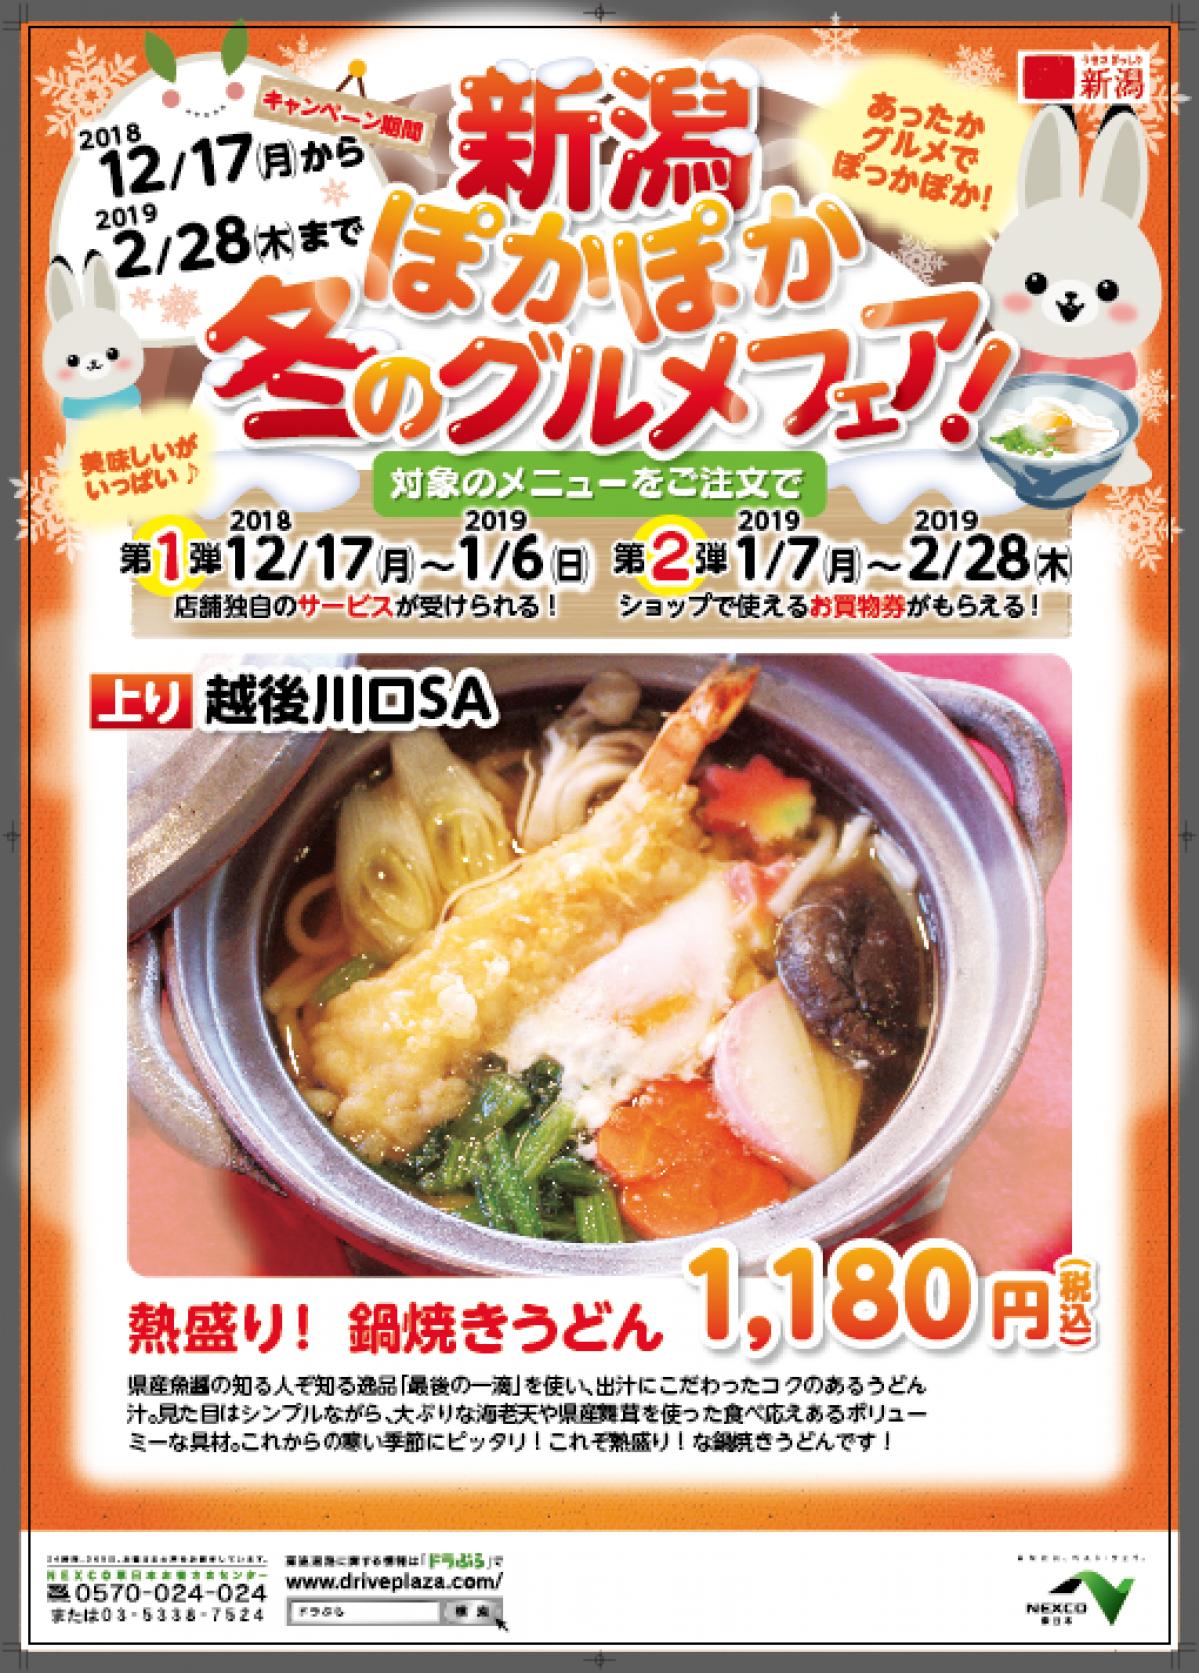 NEXCO東日本 新潟県を中心としたSA・PAで「新潟ぽかぽか冬のグルメフェア」を実施中